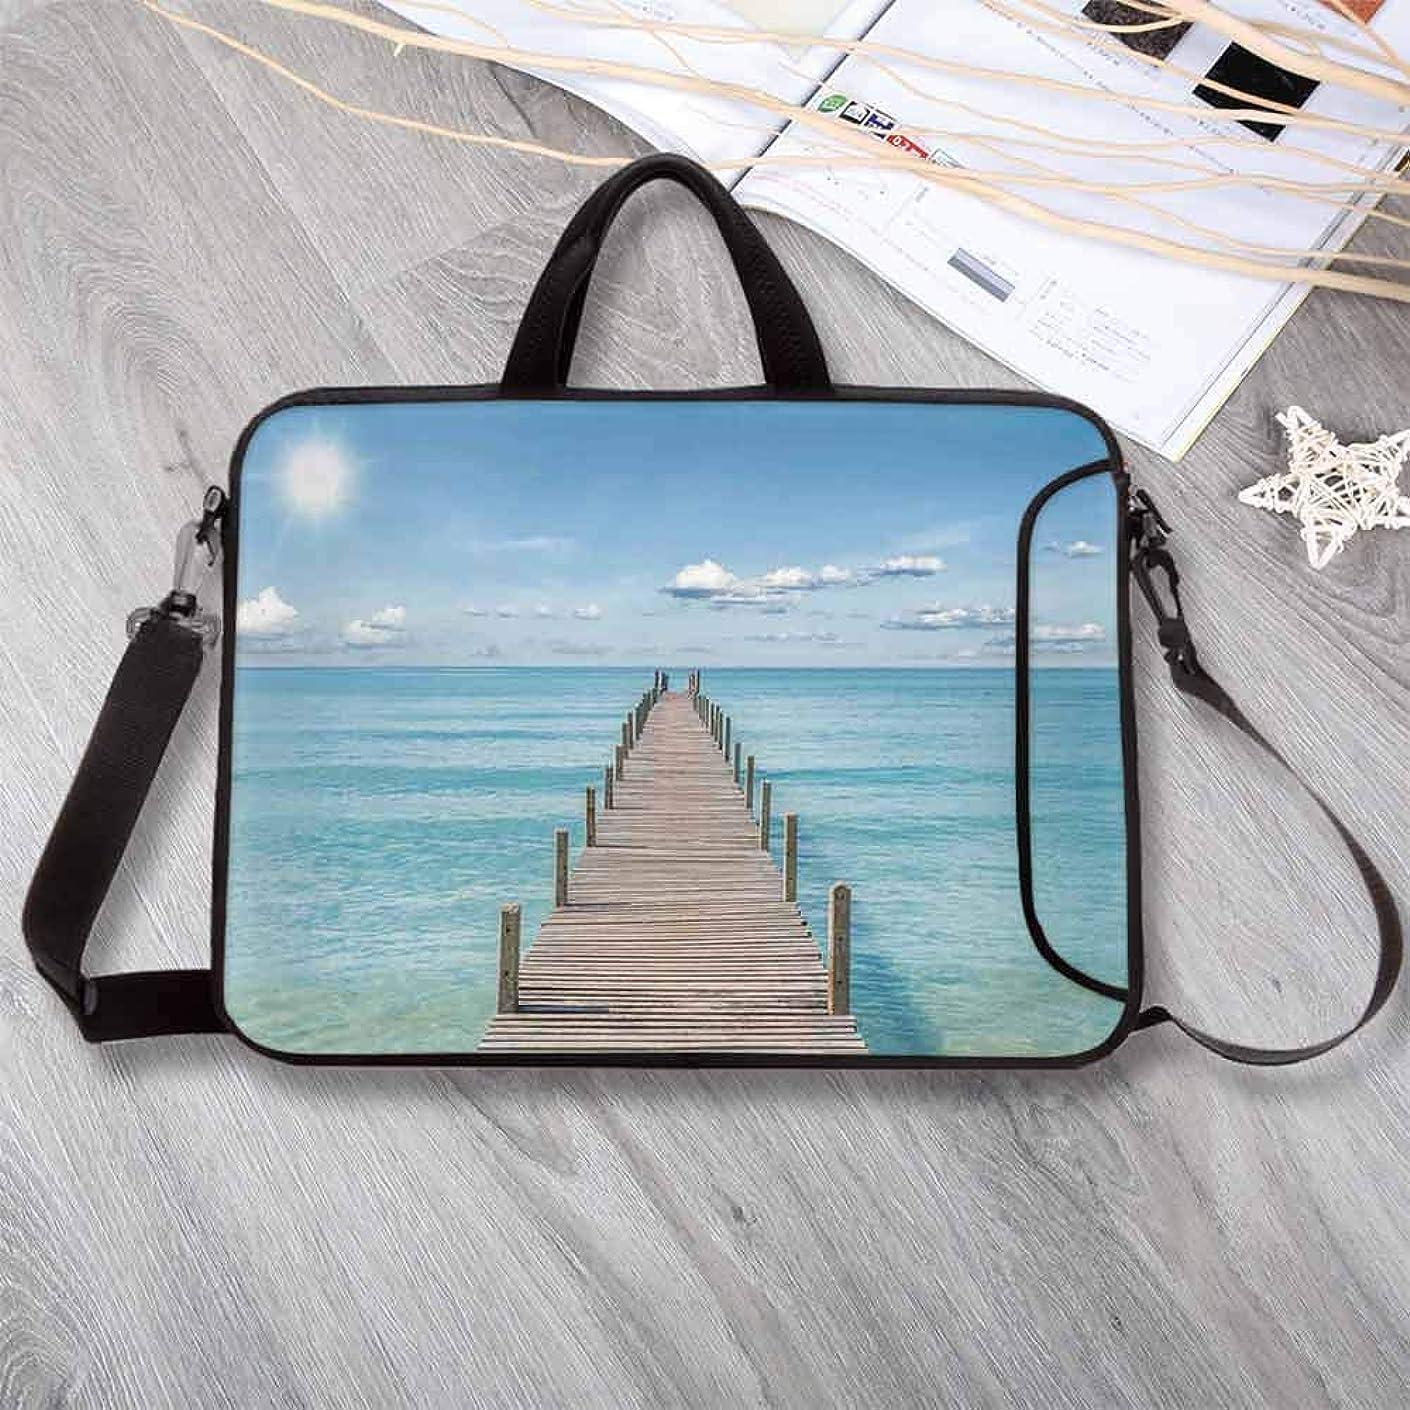 "Art Custom Neoprene Laptop Bag,Wood Pier Deck in Asian River with Sky and Sun Summer Travel Theme Art Print Laptop Bag for Men Women Students,15.4""L x 11""W x 0.8""H"